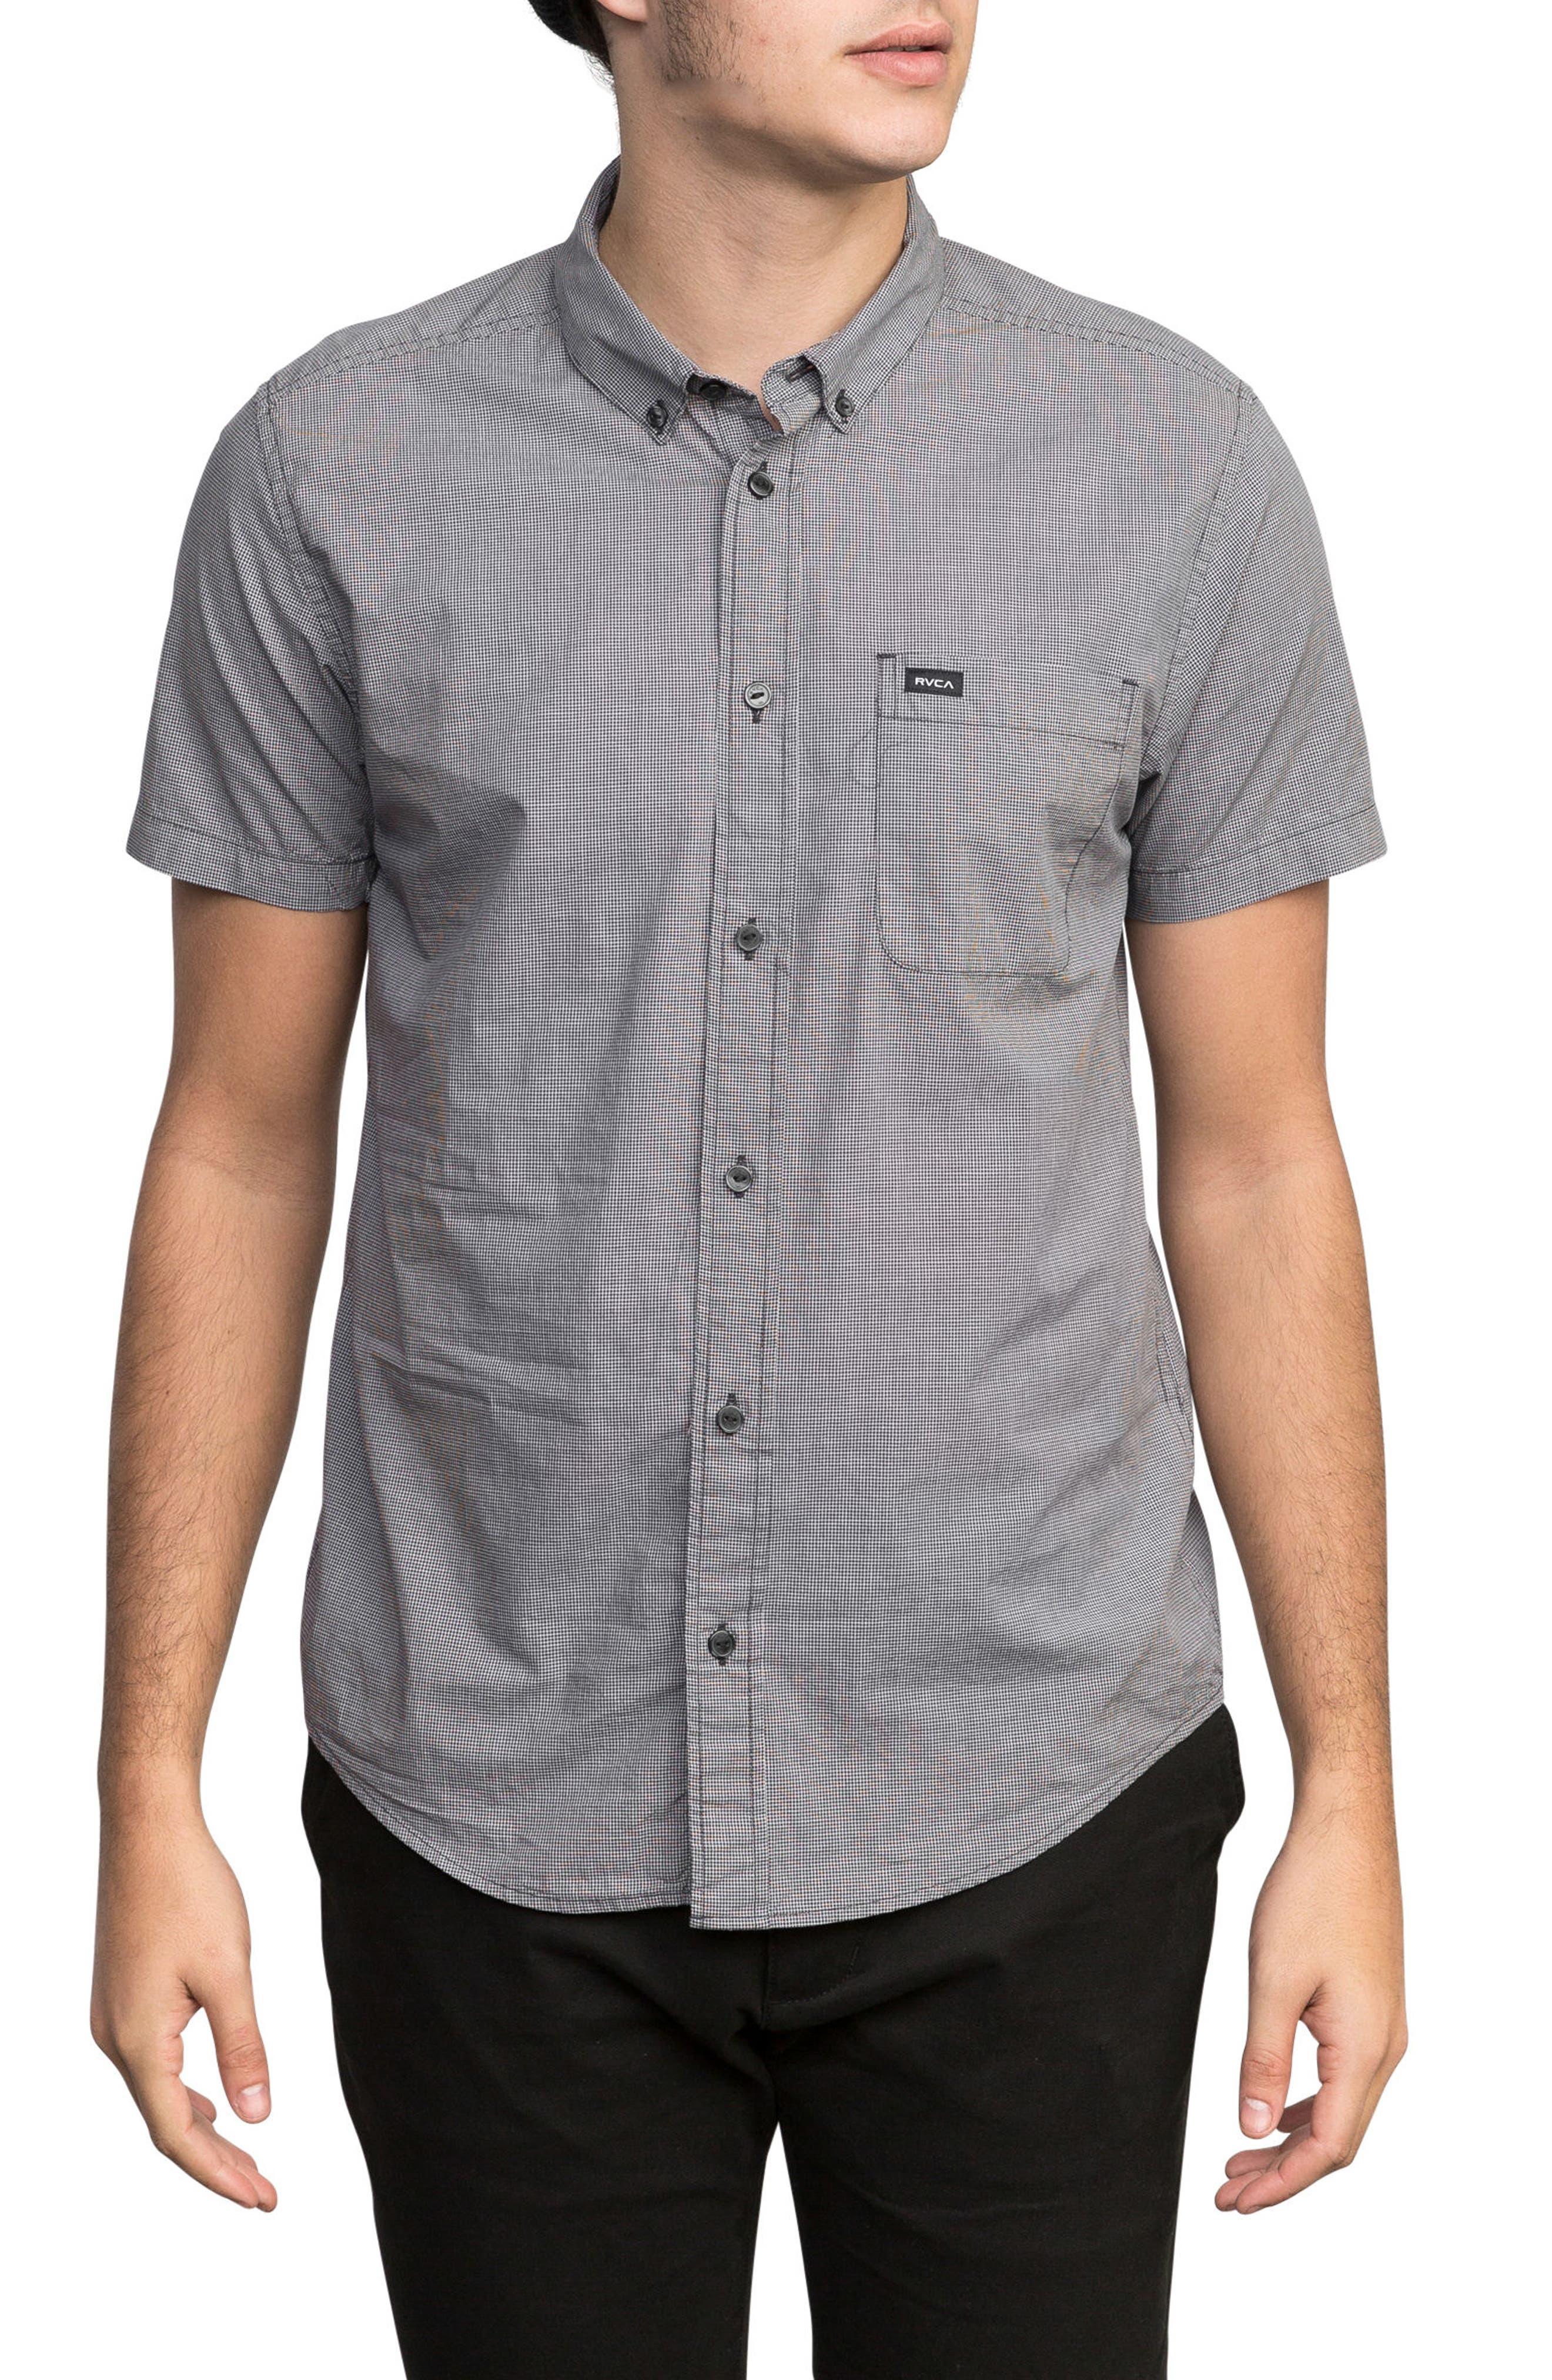 'That'll Do' Slim Fit Microdot Woven Shirt,                             Main thumbnail 1, color,                             460